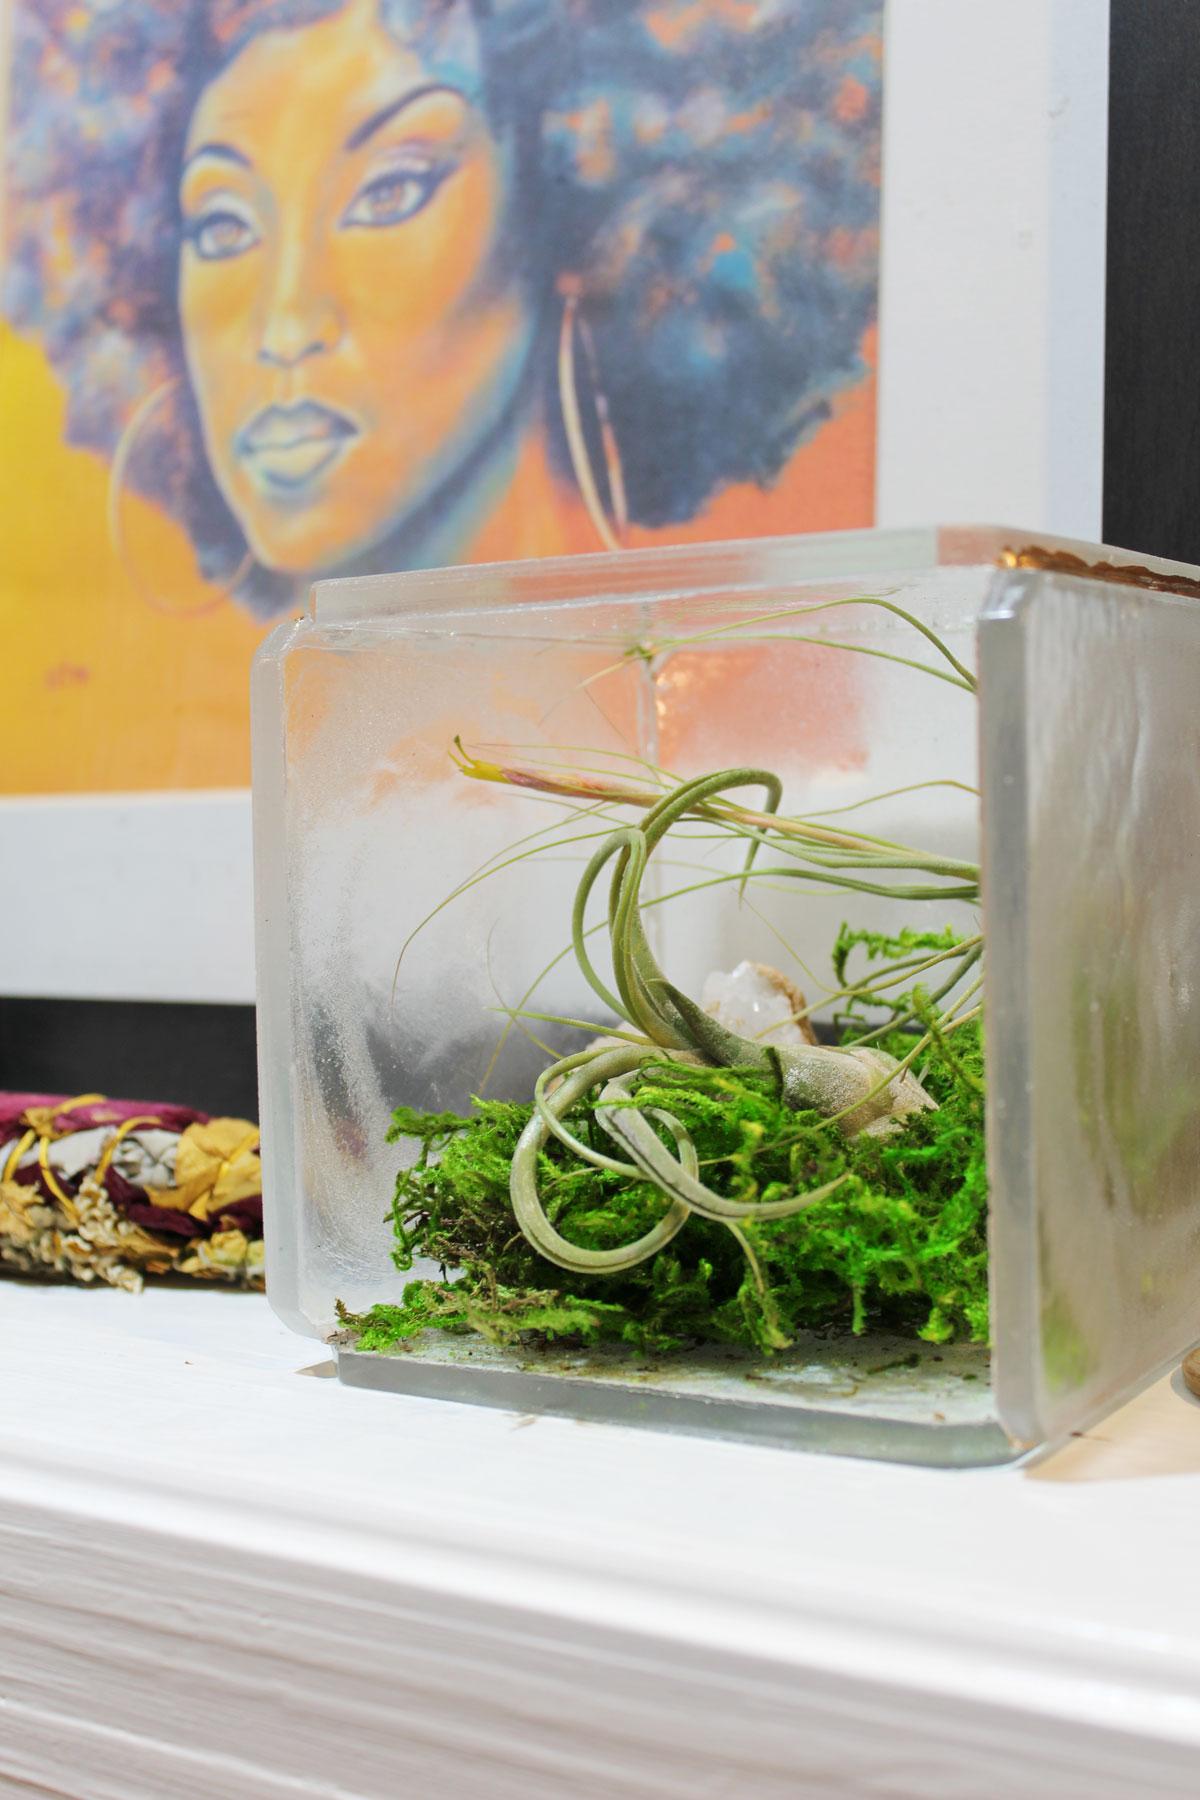 diy clear resin terrarium tutorial for displaying air plants. Black Bedroom Furniture Sets. Home Design Ideas